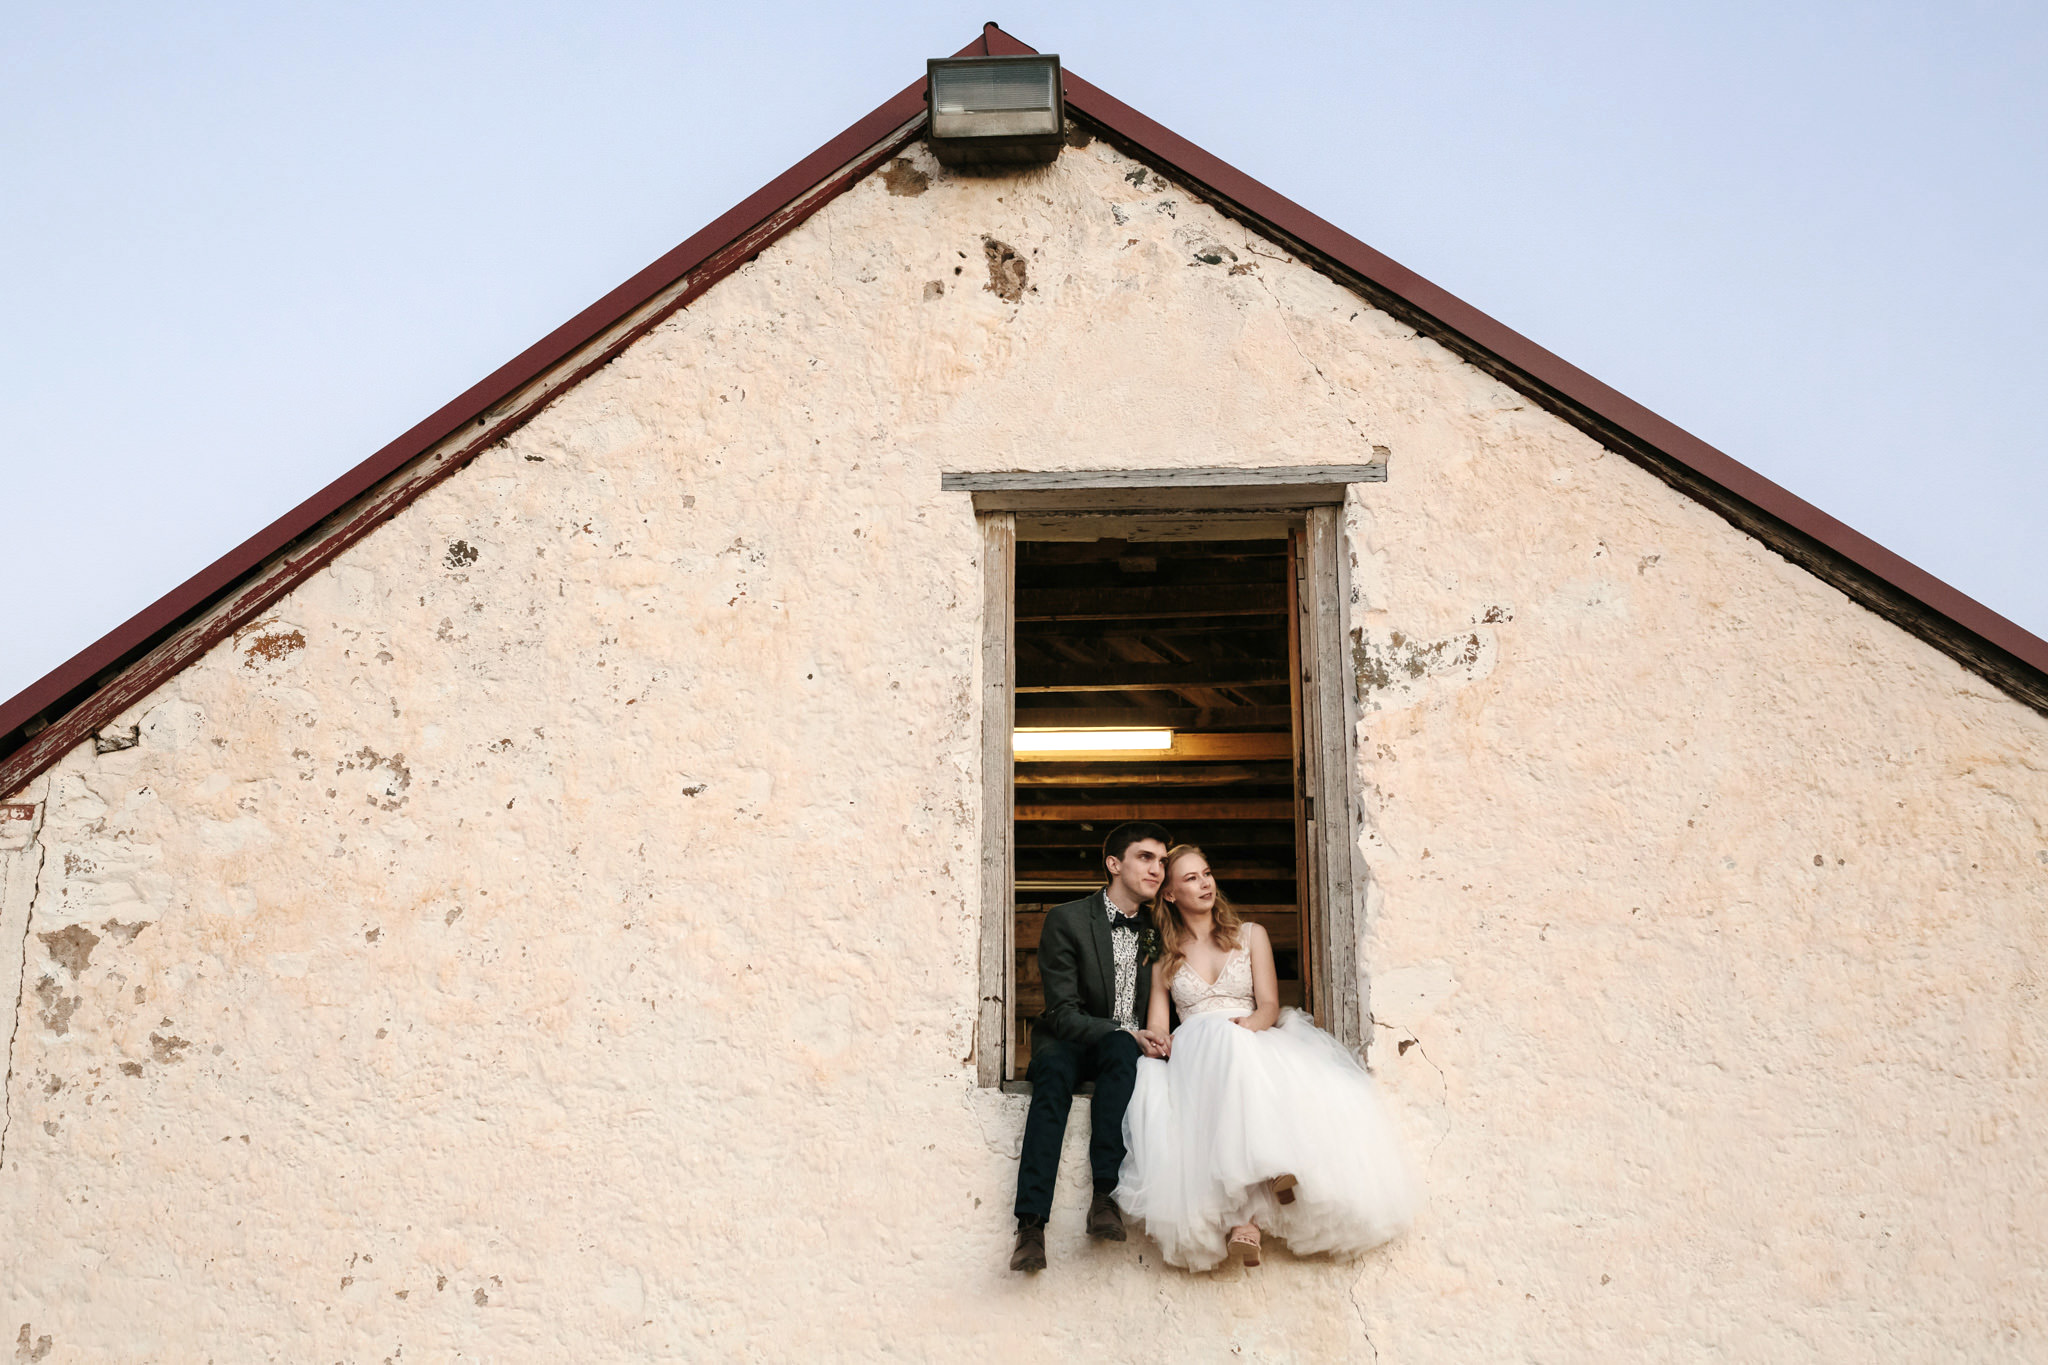 Erin_Latimore_Mudgee_Canberra_Wedding_Photographer_Tuggeranong_Homestead_530.JPG